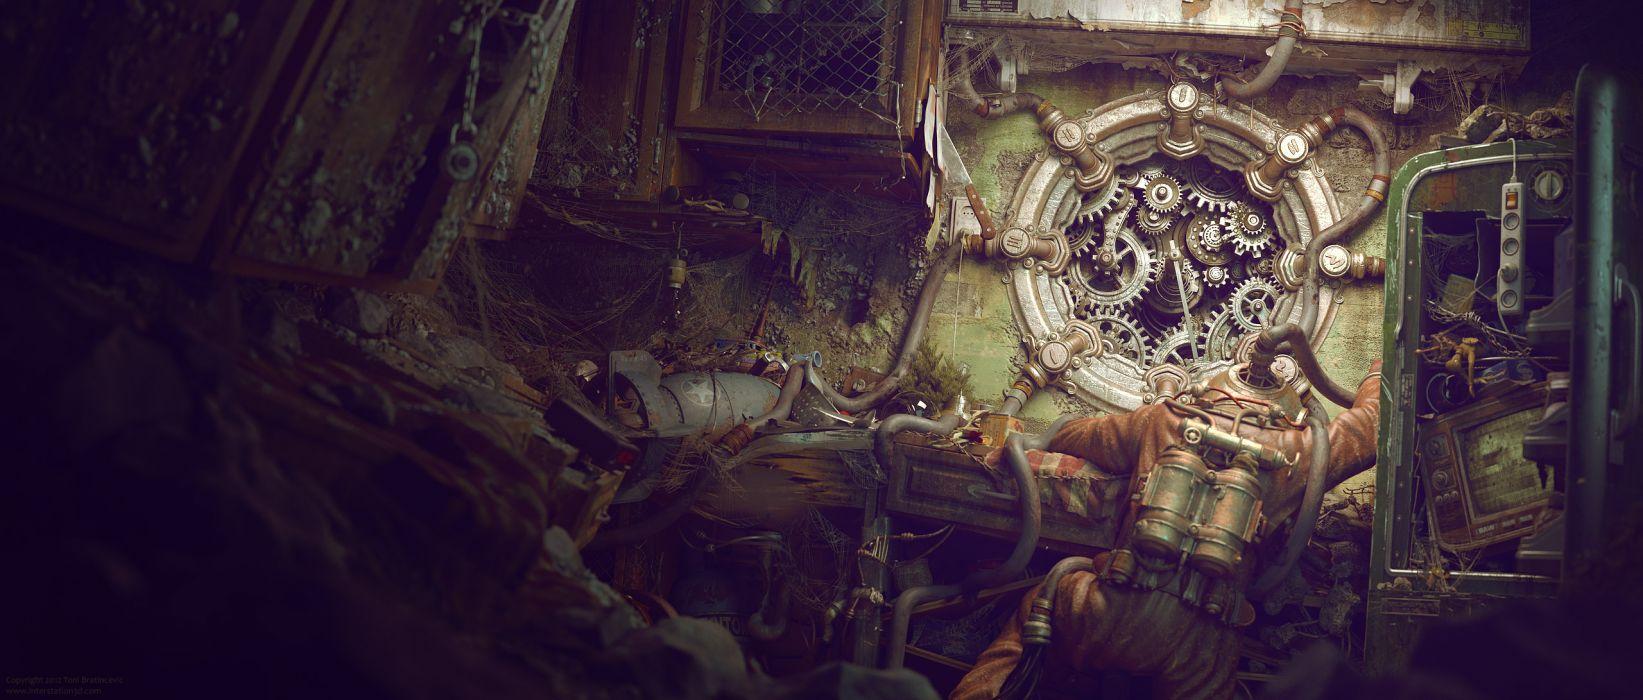 sci-fi steampunk dark horror diving diver fantasy wallpaper